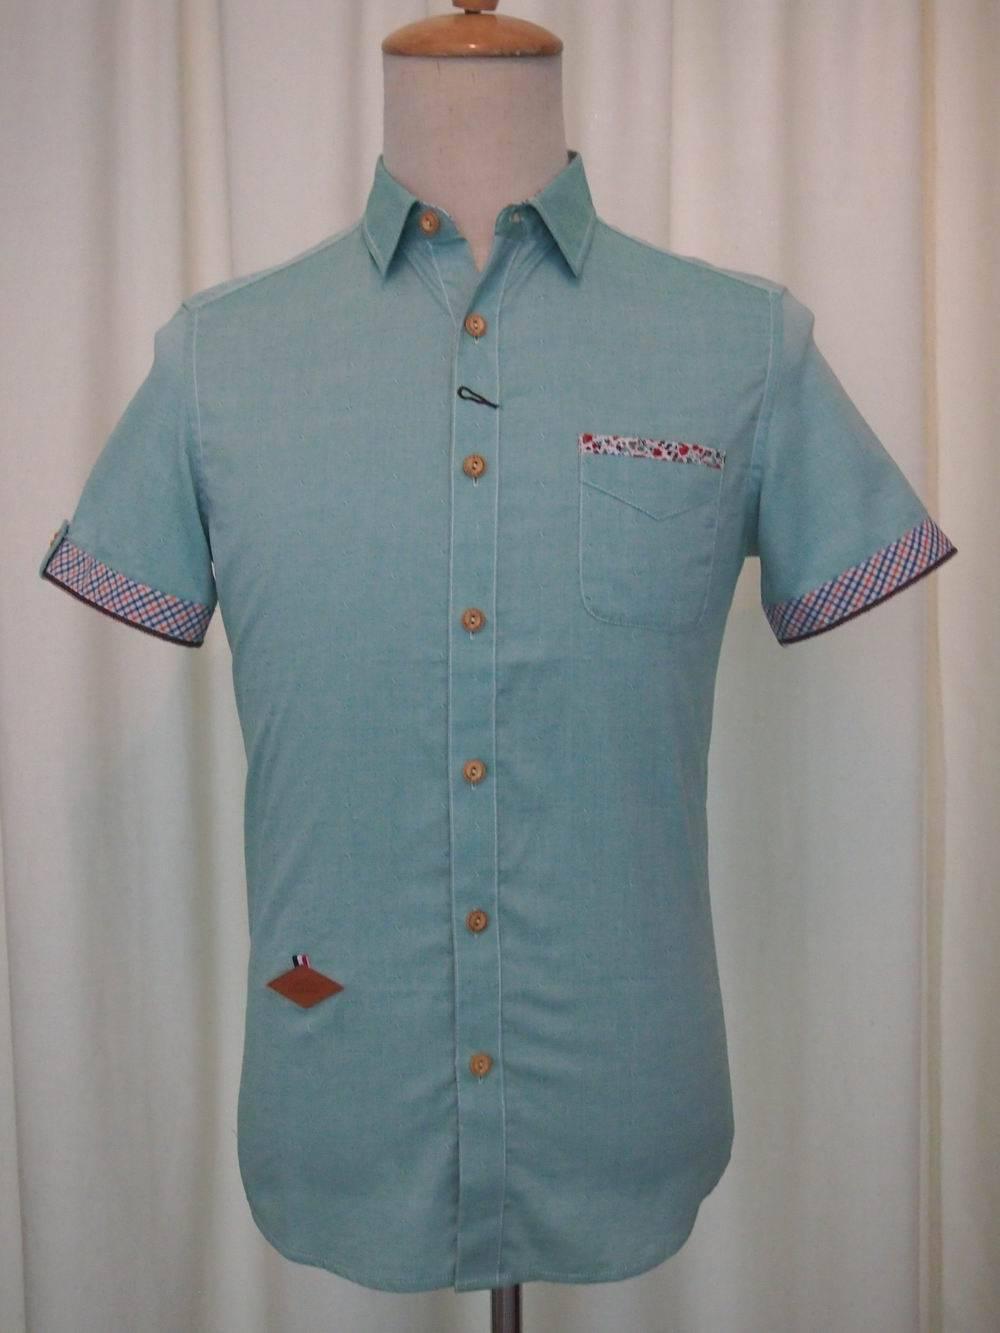 Men's Short Sleeve Shirt solid dyed jacquard fabrics 2015Fashion NEW